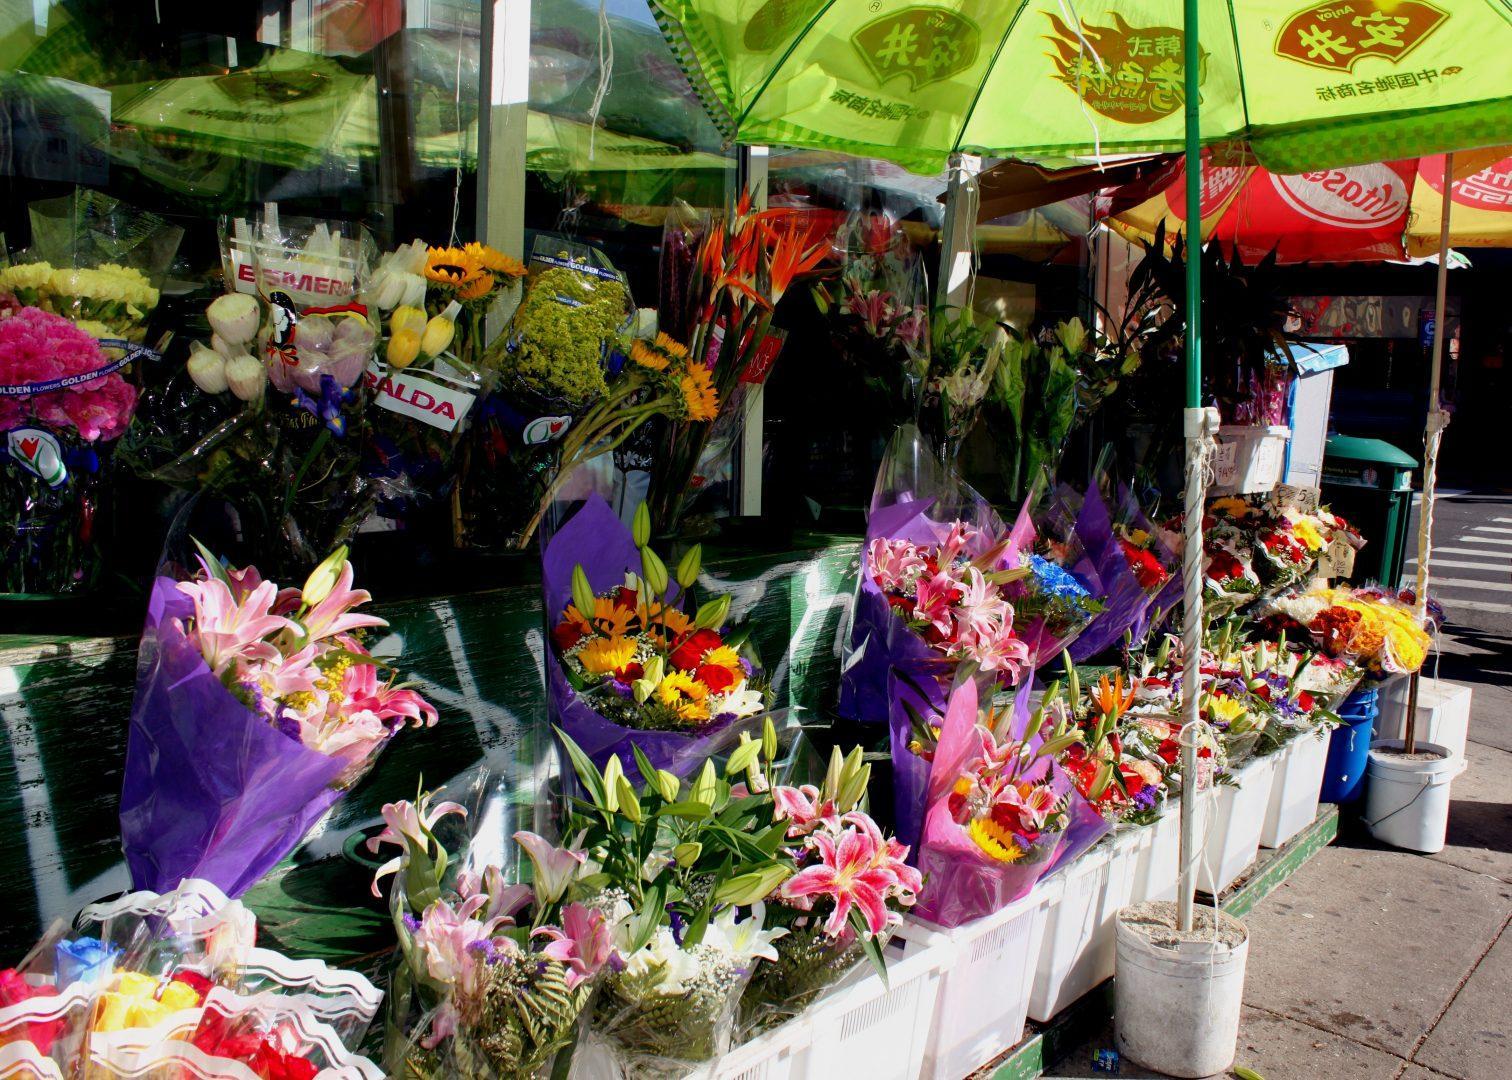 Celebrate Valentine's Day past February 14! (Courtesy of Prayitno Hadinata via Flickr